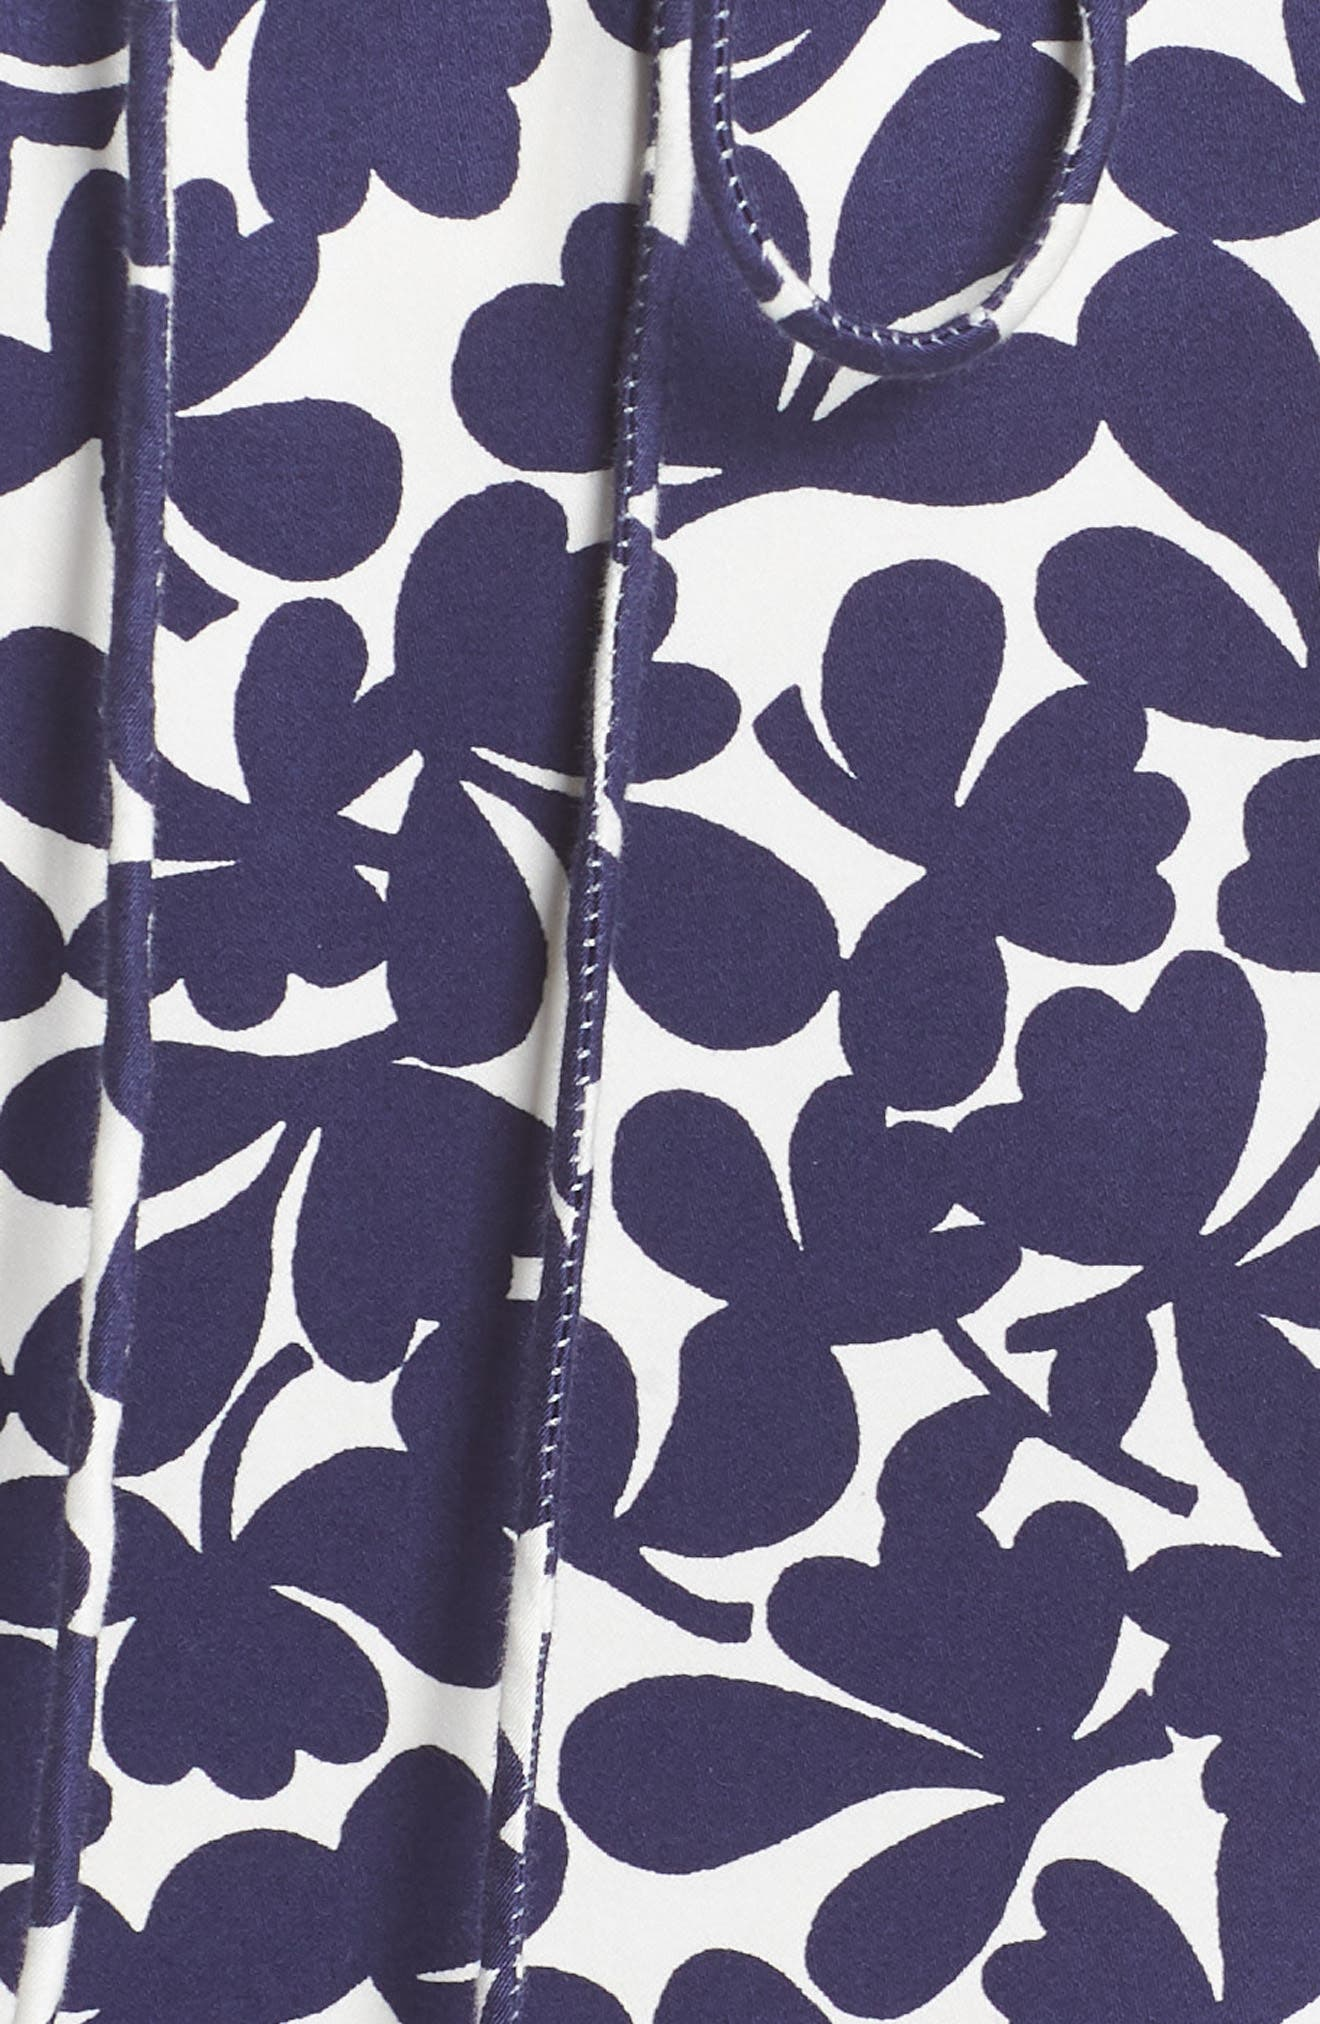 Lady Luck Print Cotton Sateen Dress,                             Alternate thumbnail 6, color,                             488